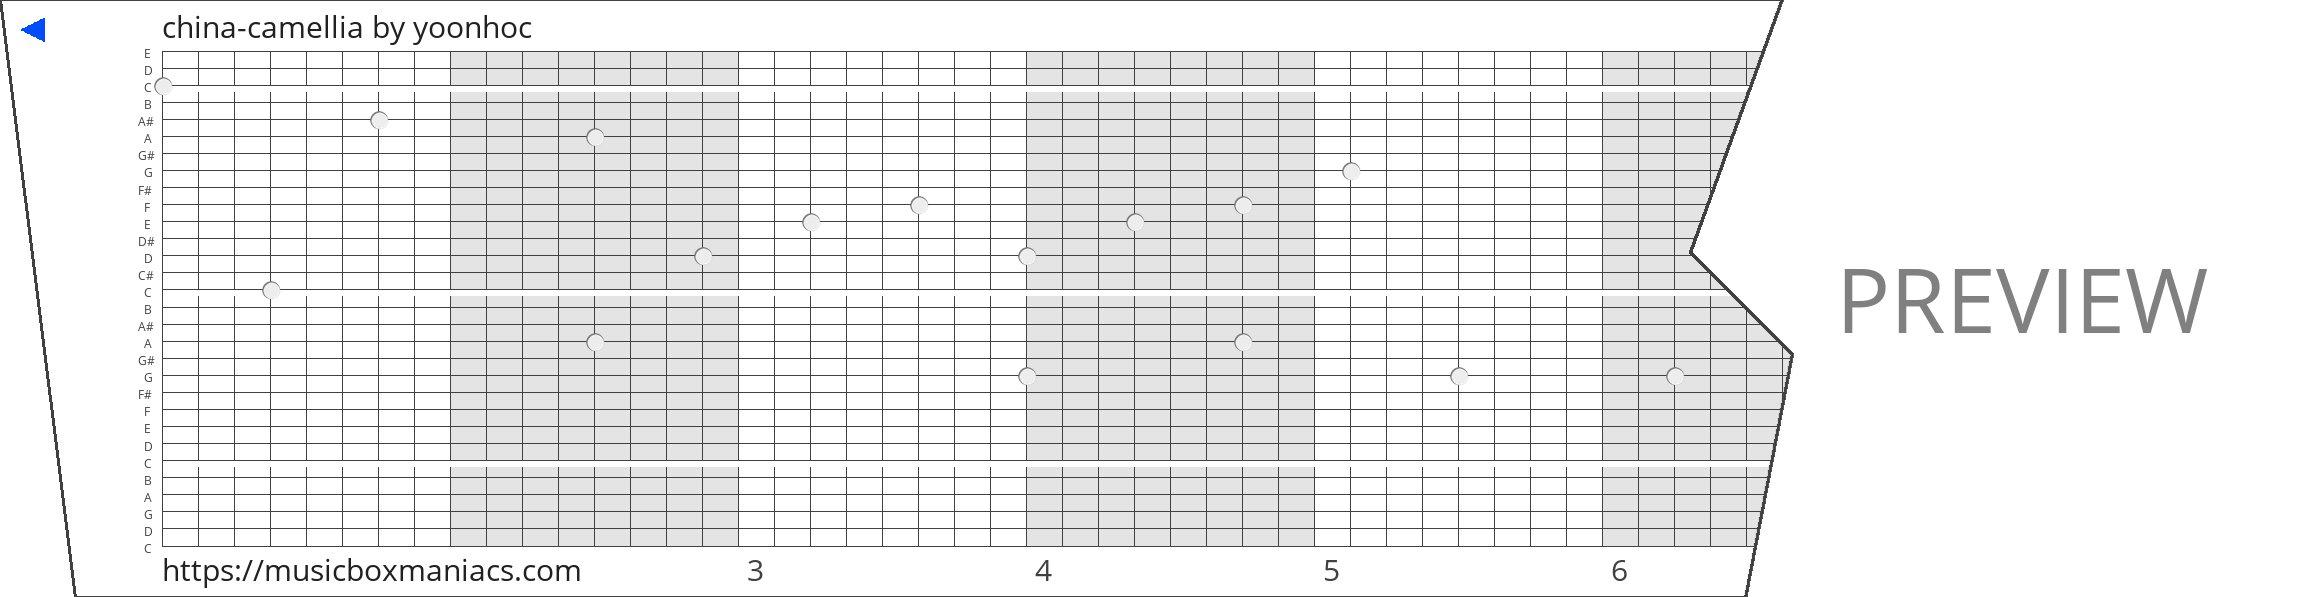 china-camellia 30 note music box paper strip